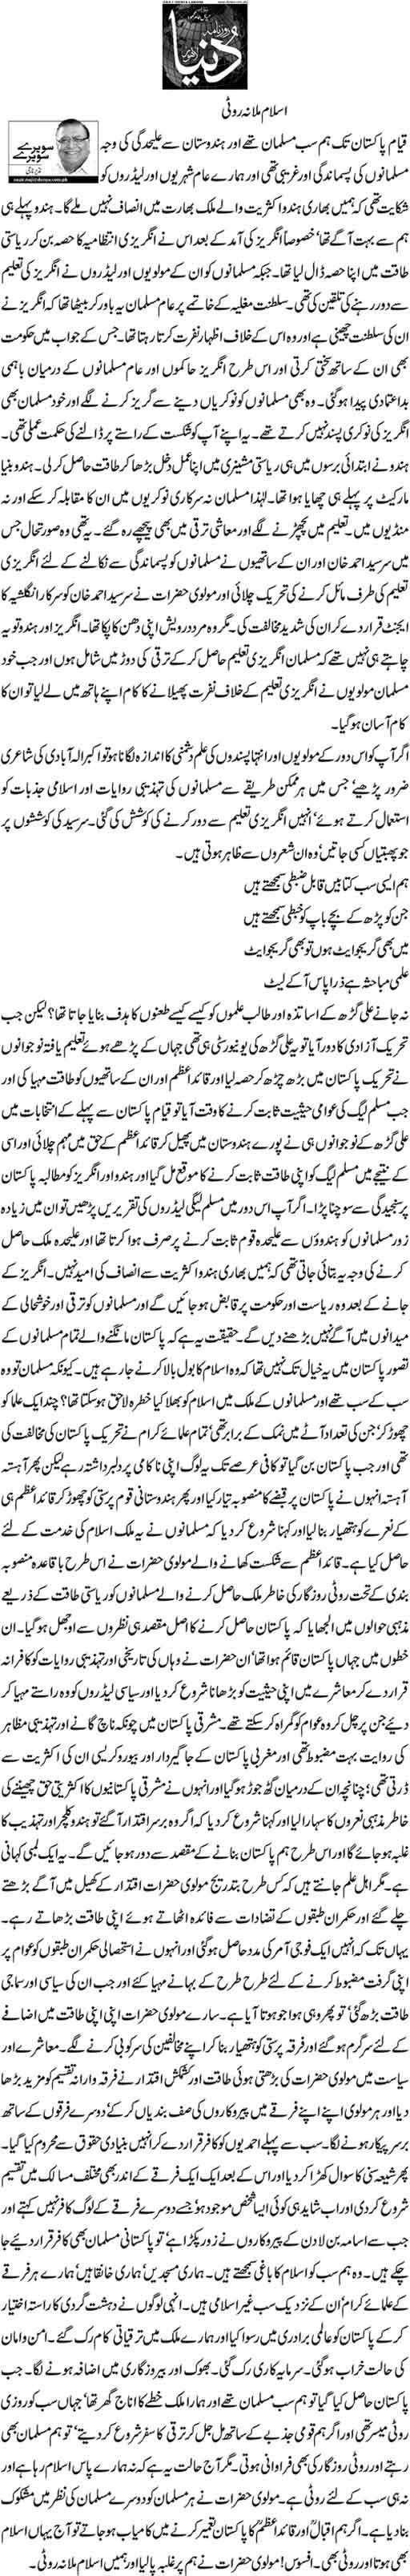 Islam Mallana roti - Nazeer Naji